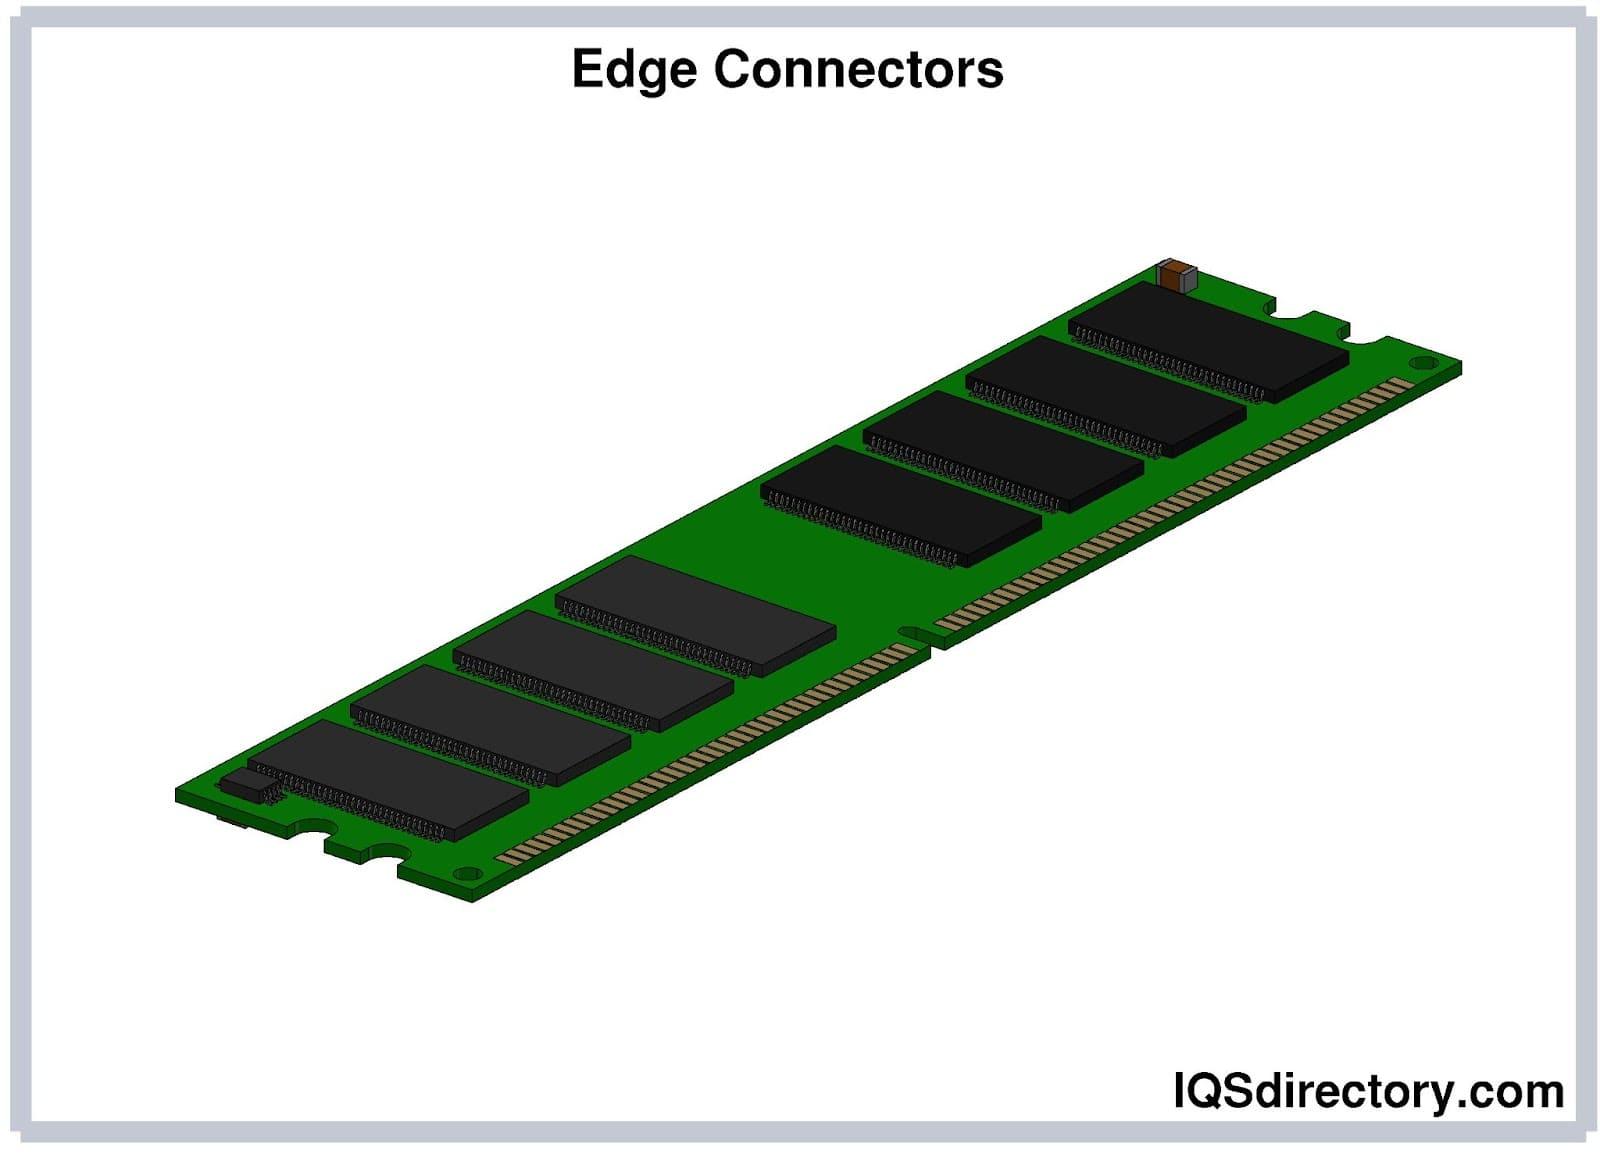 Edge Connectors